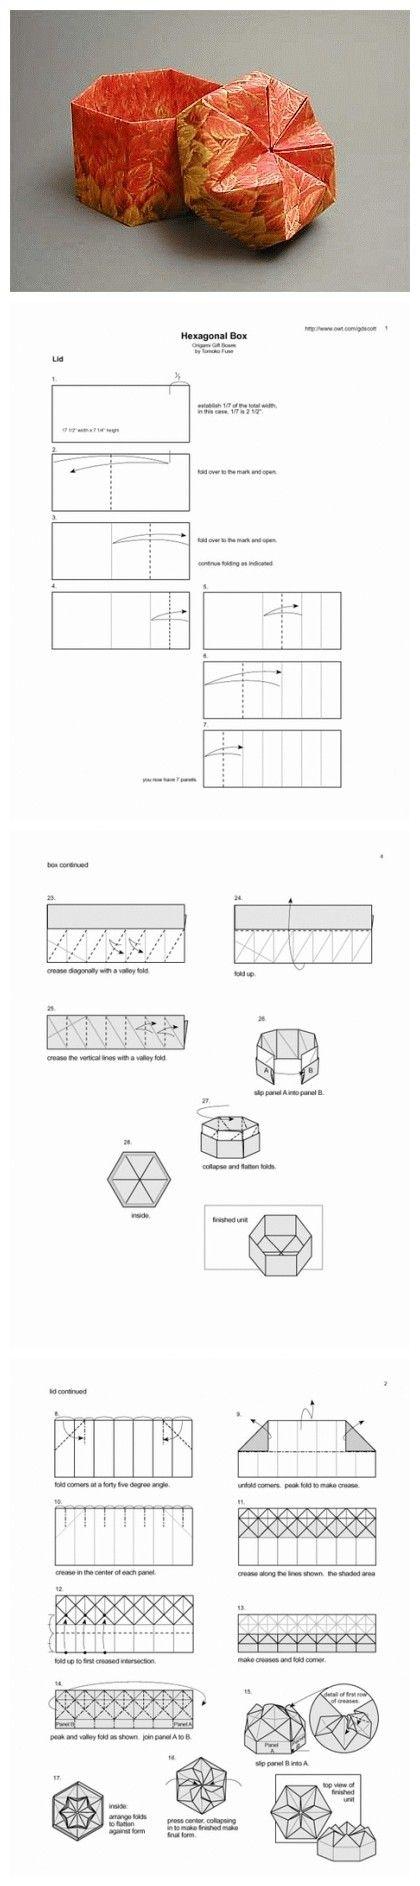 origami hexagonal box folding instructions origami instruction